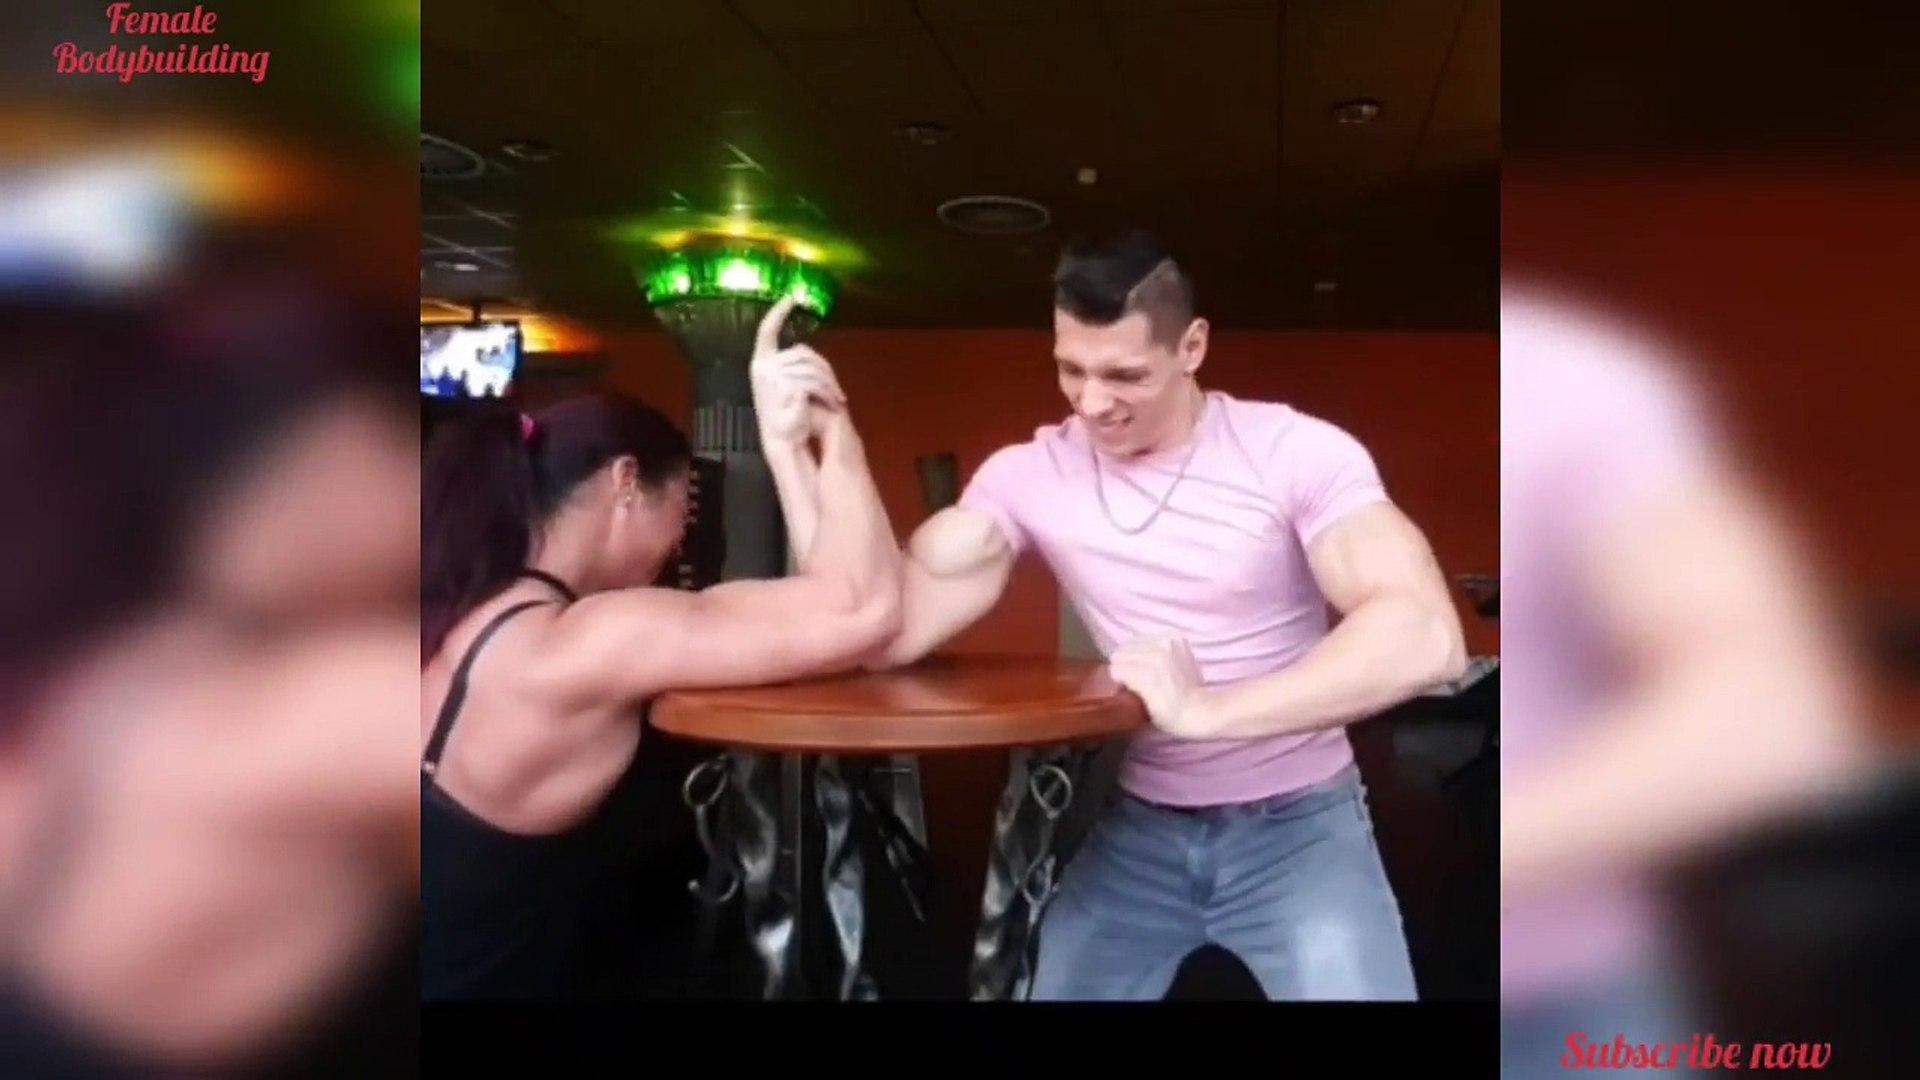 Renata Hronova Big Muscle Girl vs Muscle Man Arm Wrestling Challenge. Strongest women FBB